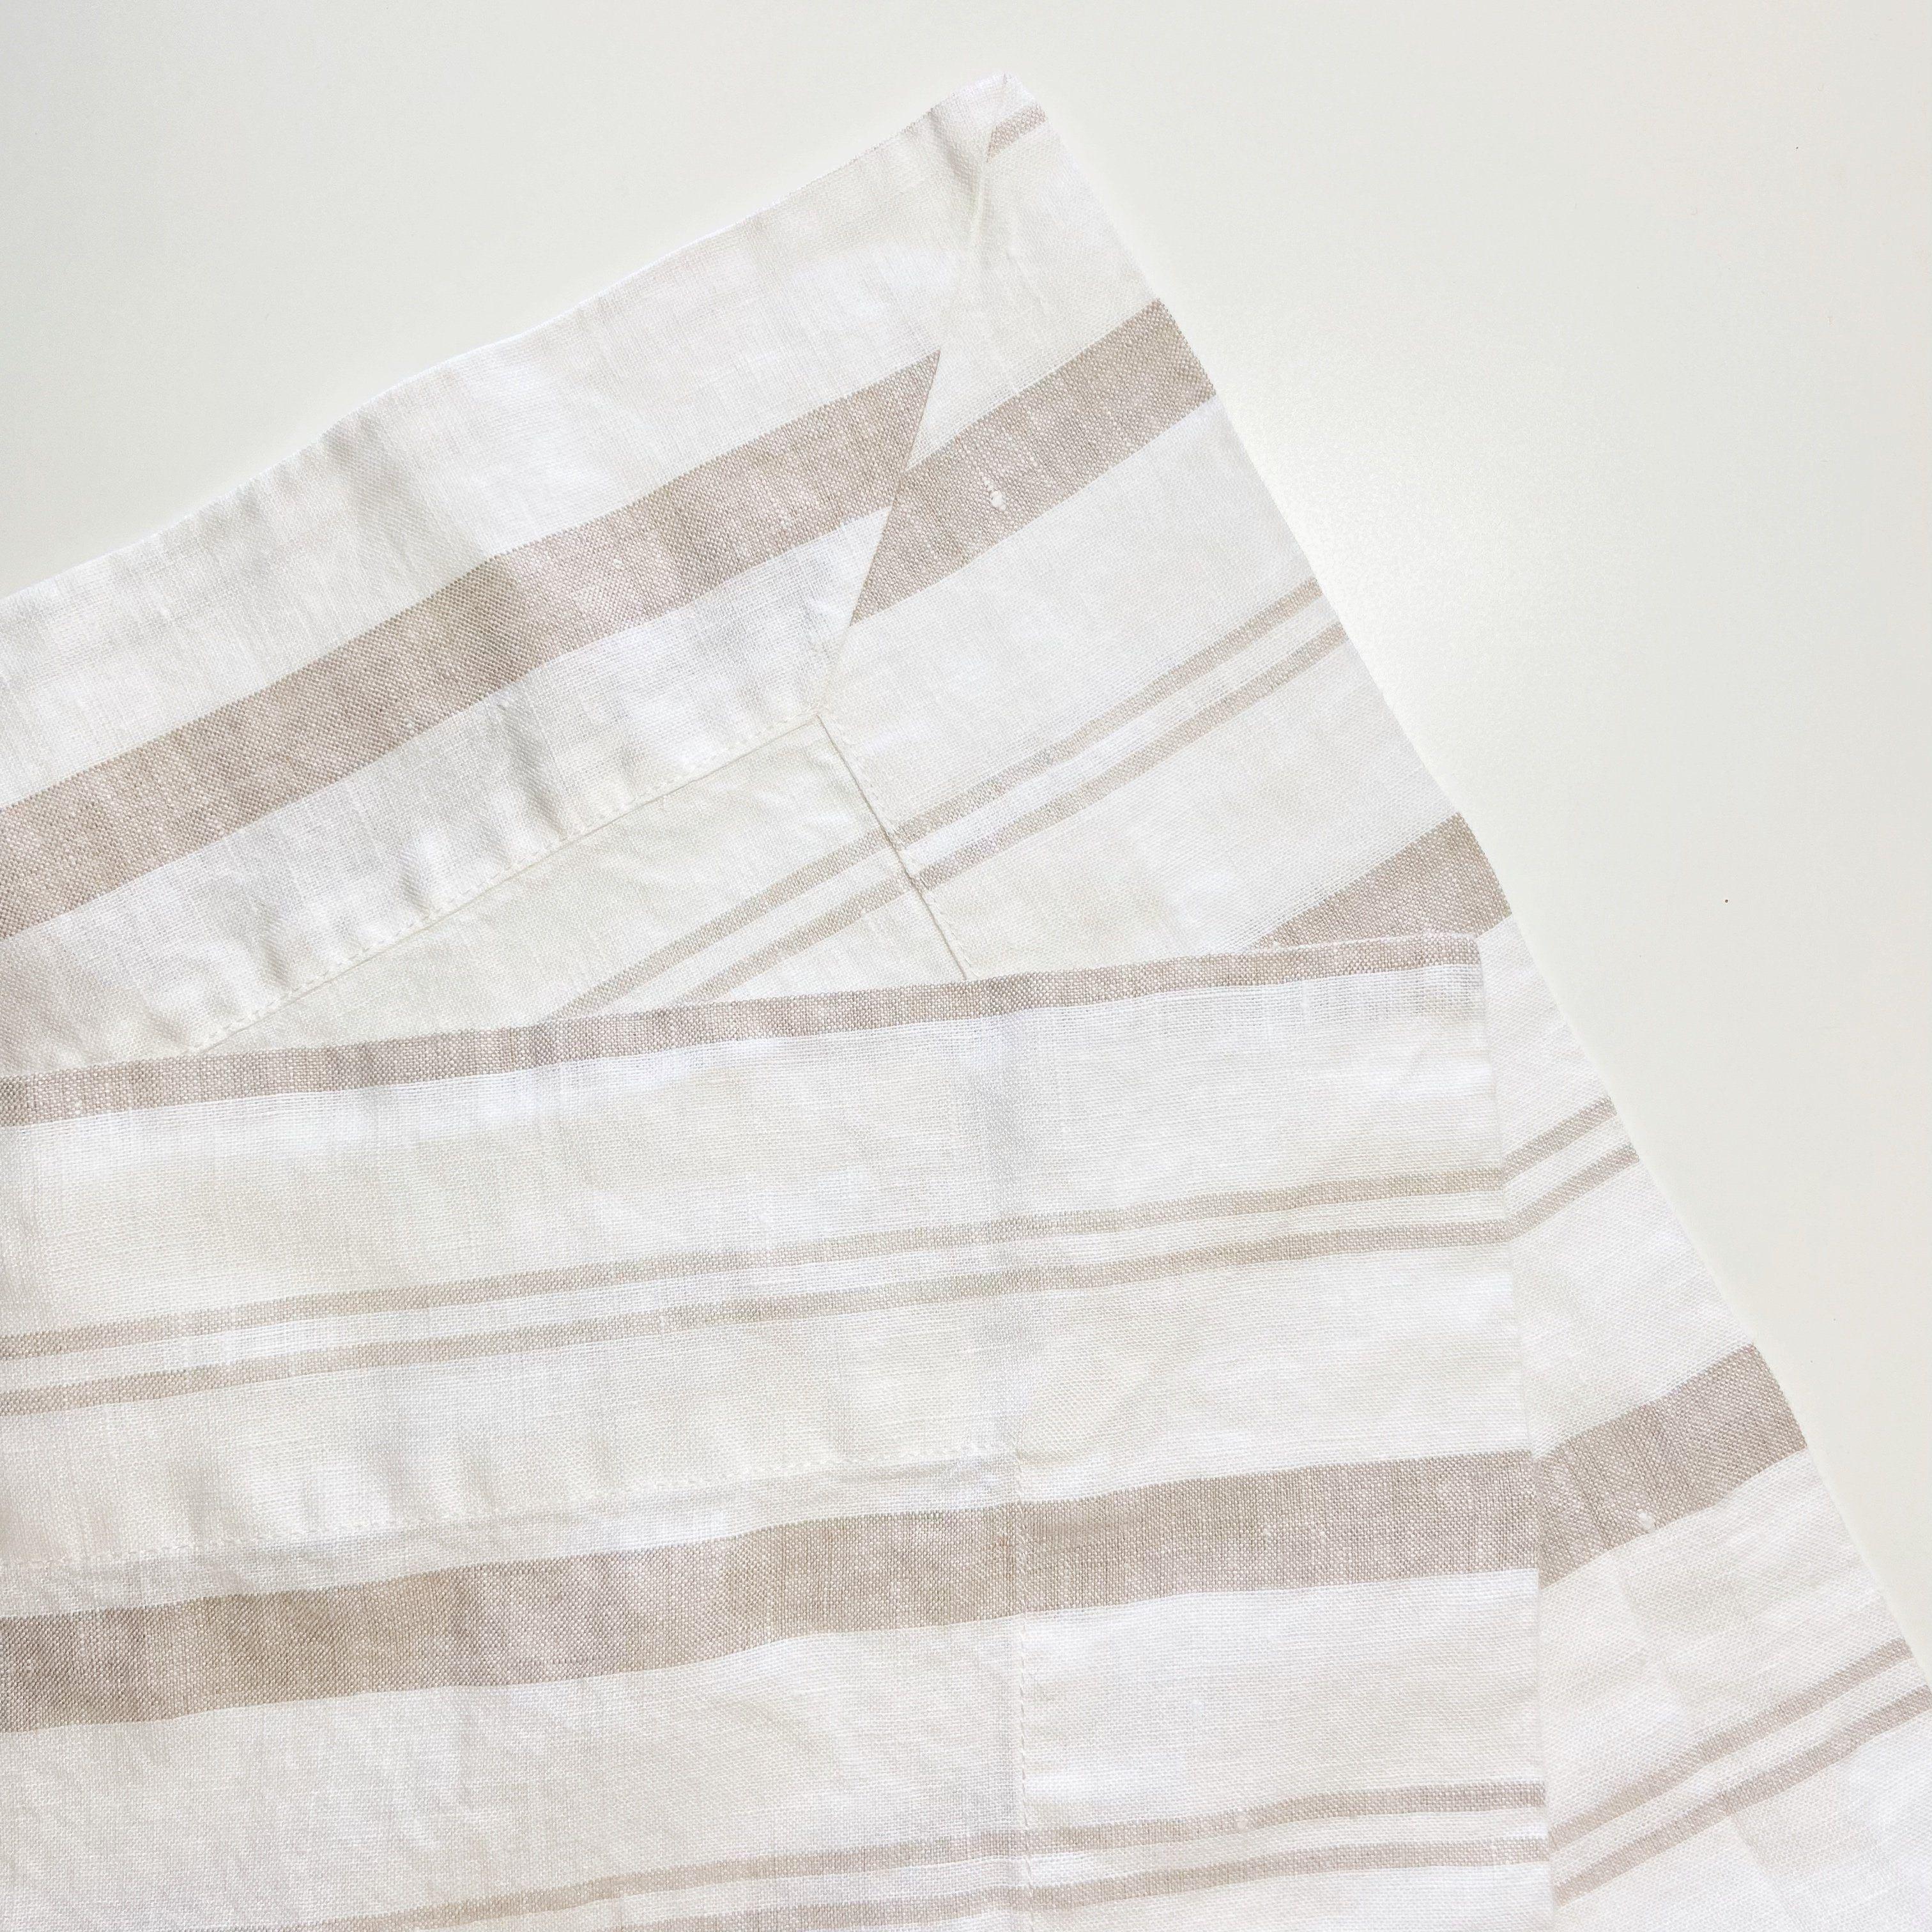 Striped Table Runner - Beige Stripe